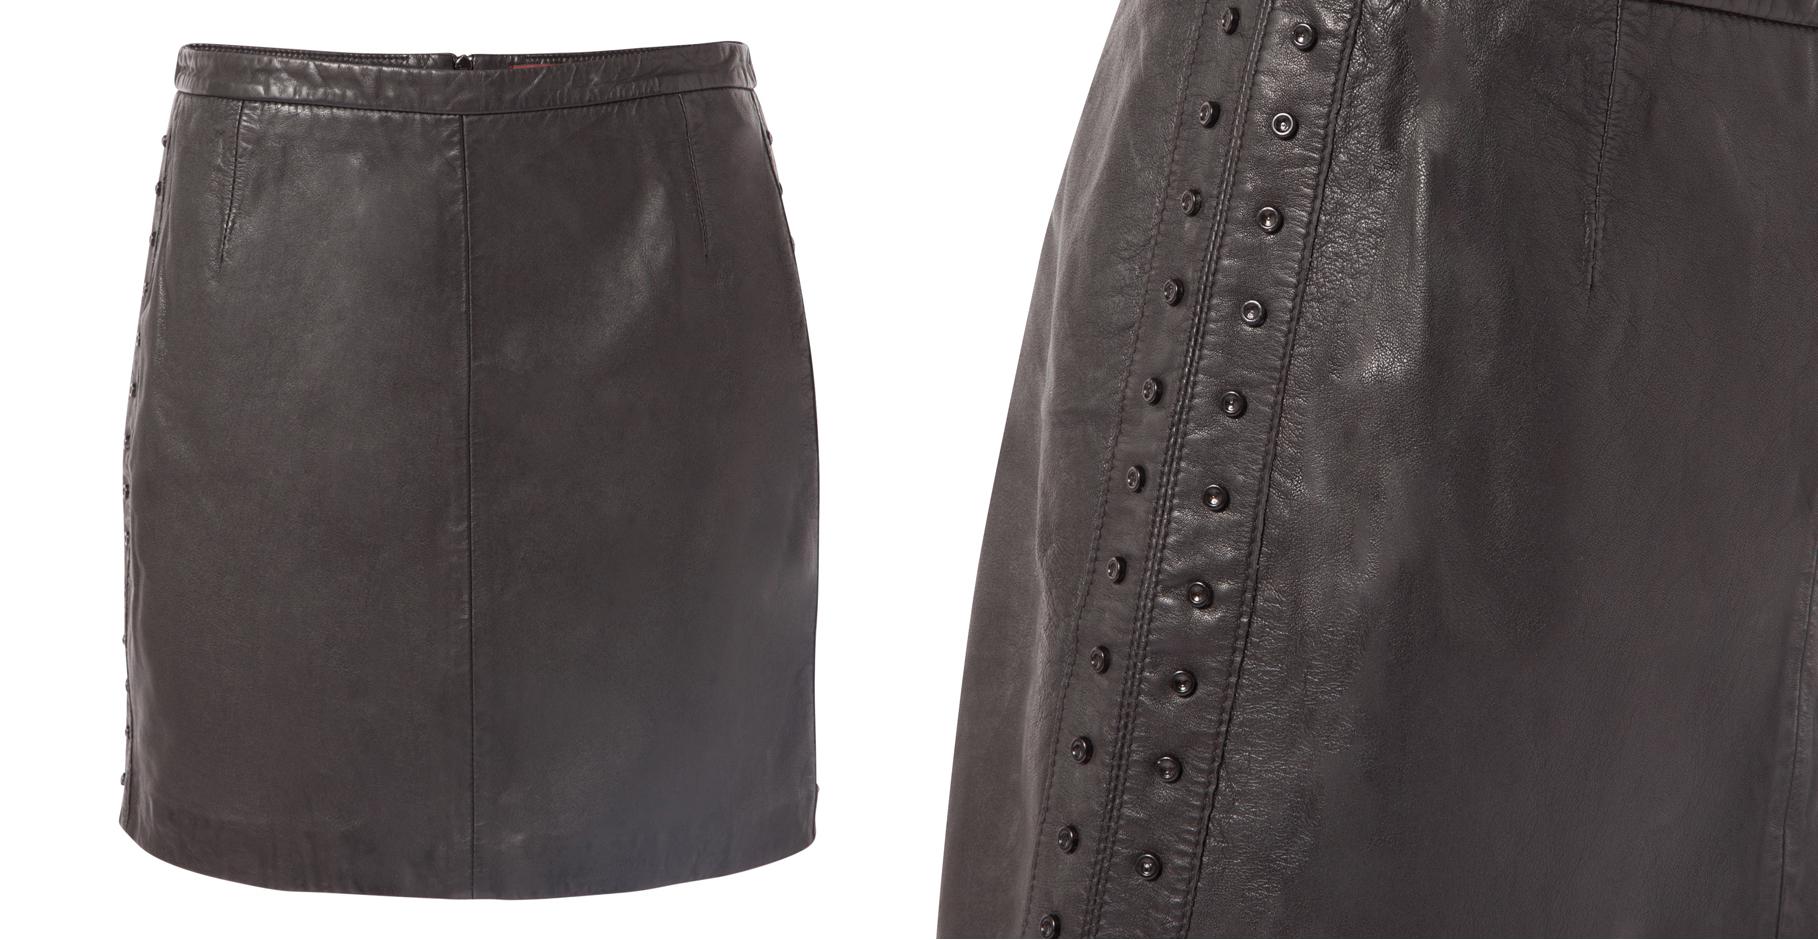 trendy_taste-look-outfit-blog-blogger-fashion_spain-moda_españa-giveaway-sorteo-comptoir_des_cotonniers-collage-3